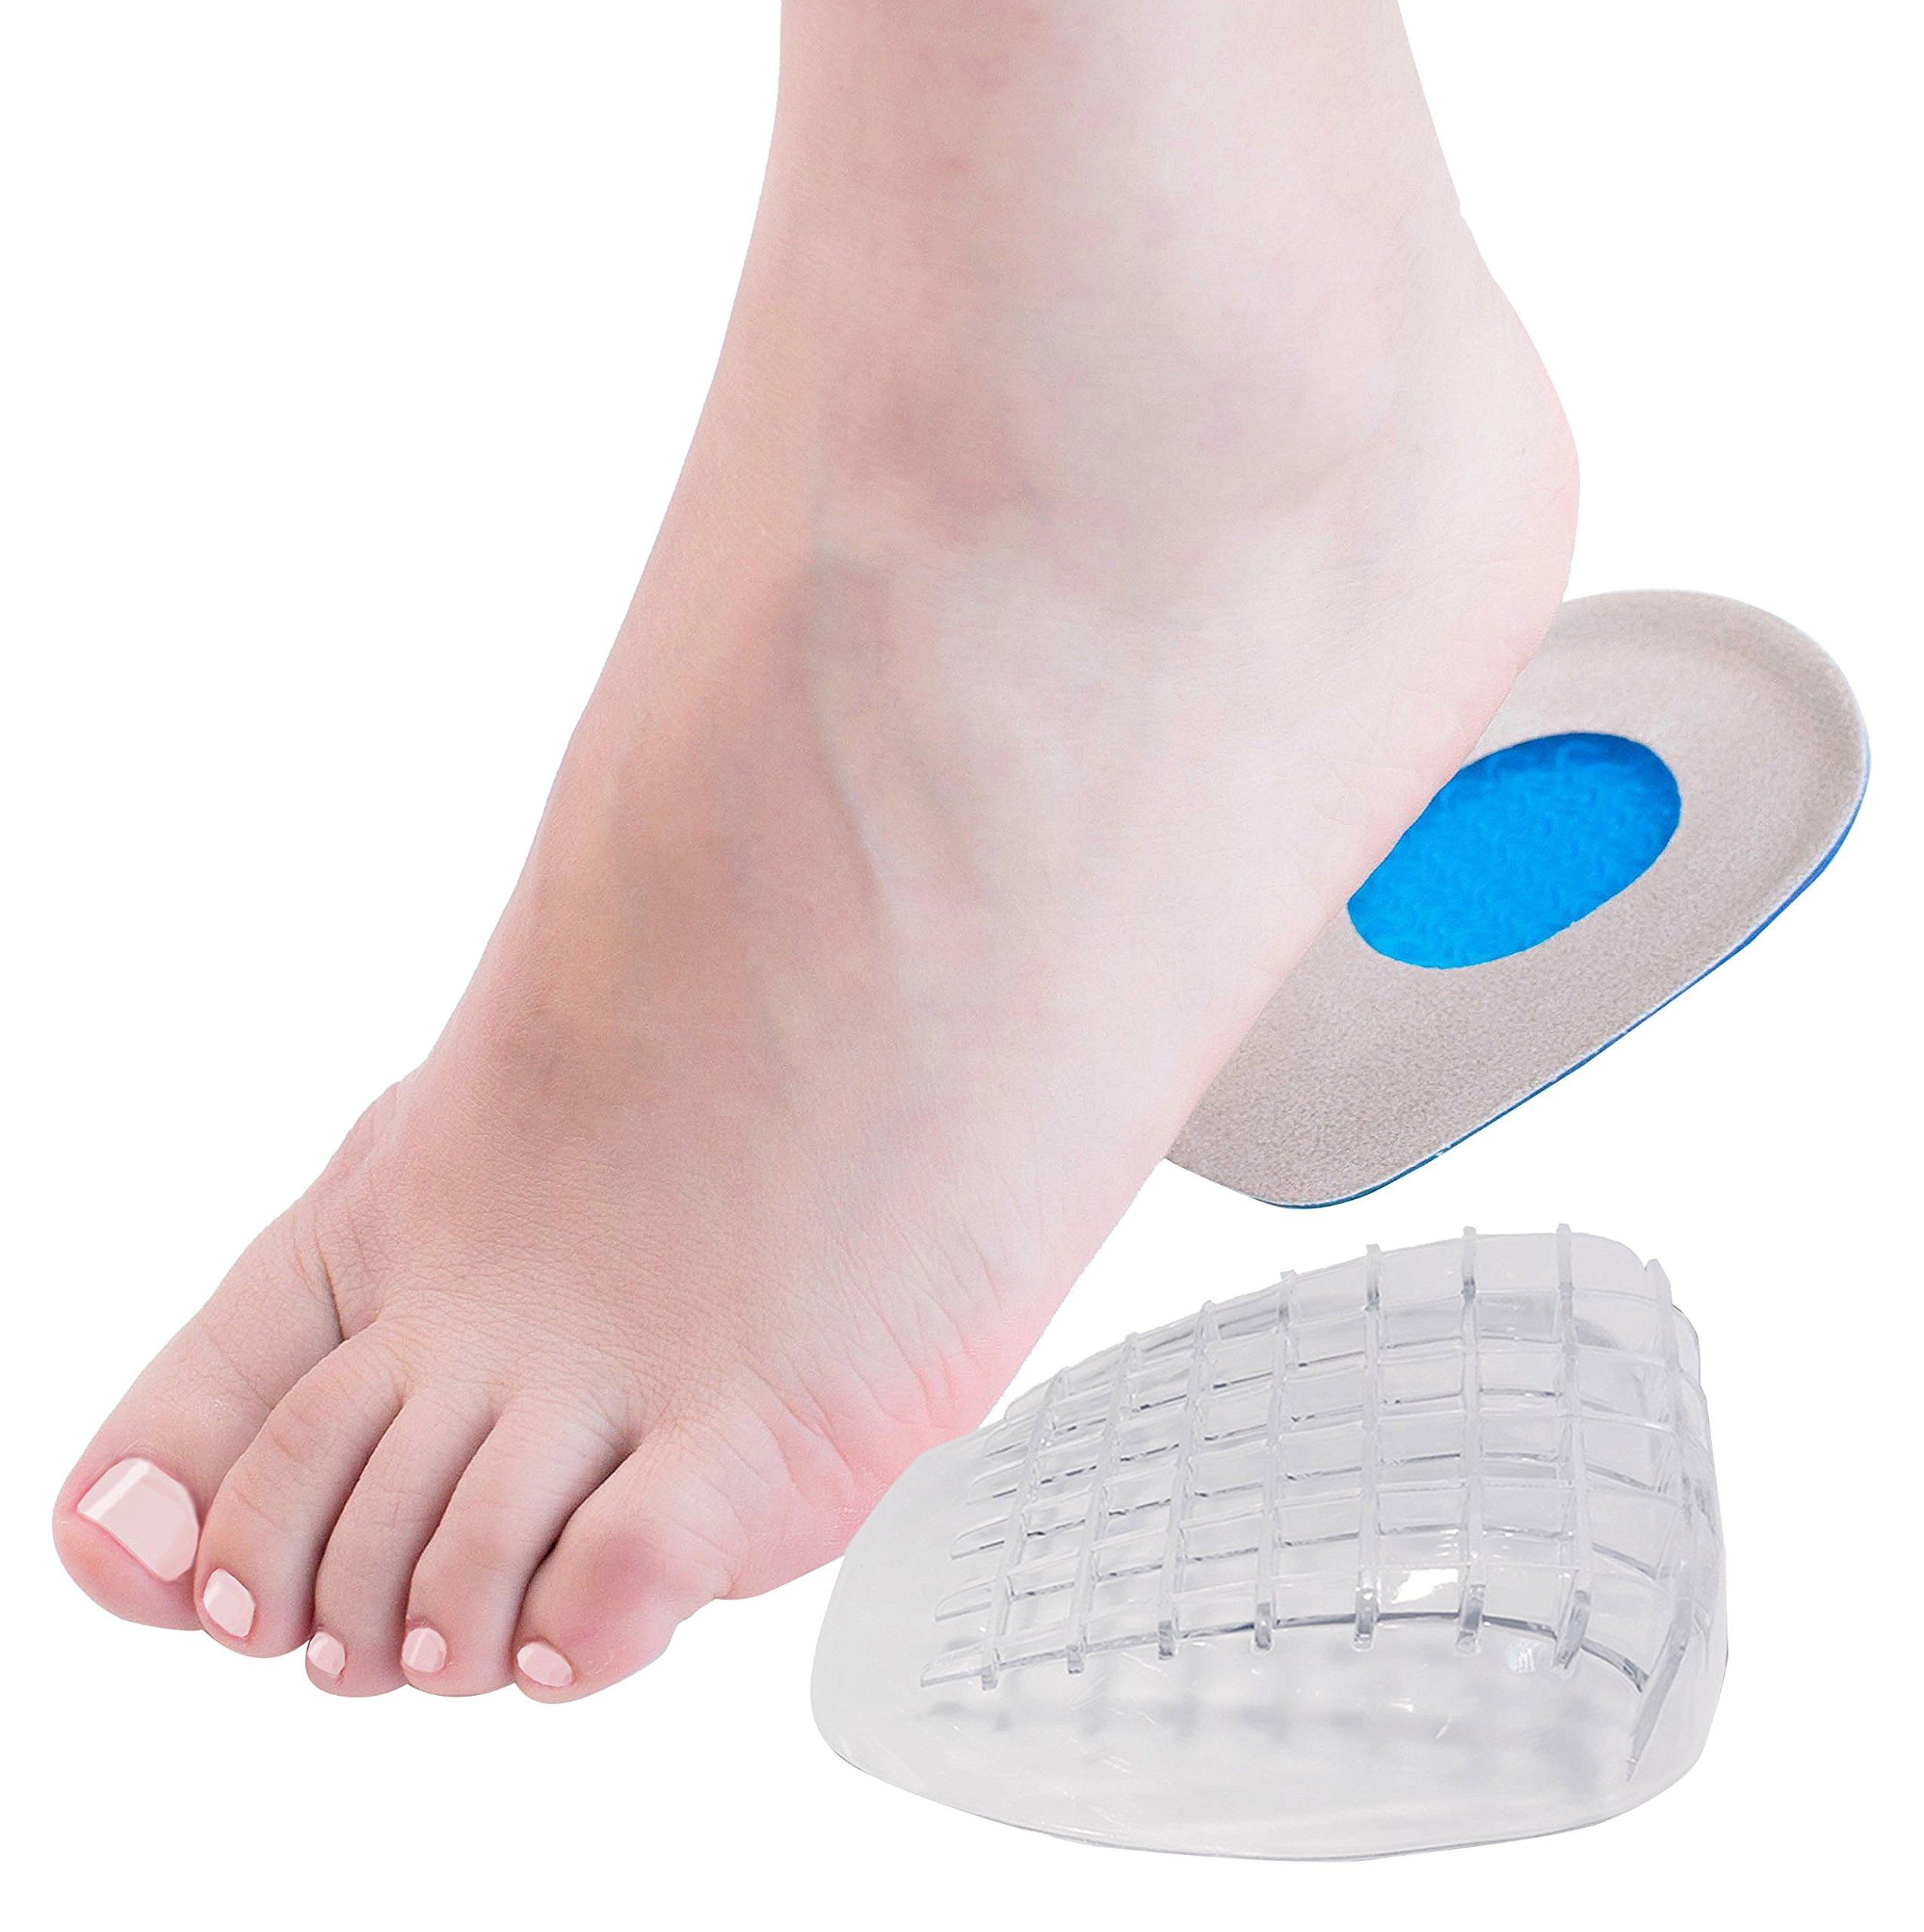 Amazon.com: Dr. Foot\'s Heel Pads, Silicone Heel Cups and PU Gel Heel ...